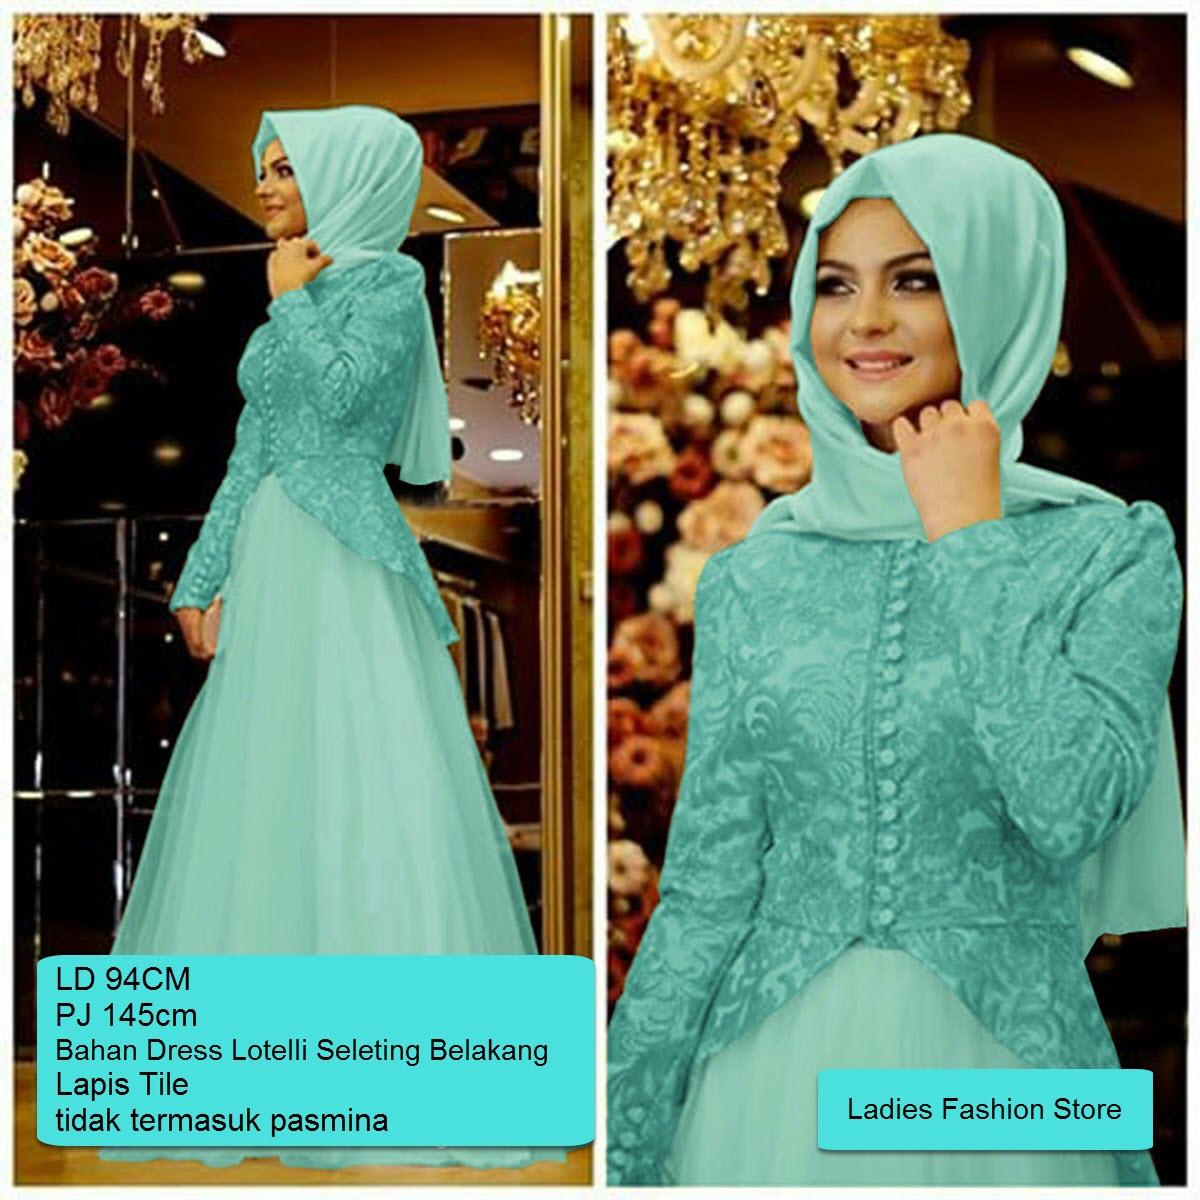 4de304eb3047dcbf63d512d1e5c694d5 Review List Harga Dress Muslim Pesta Pernikahan Teranyar tahun ini